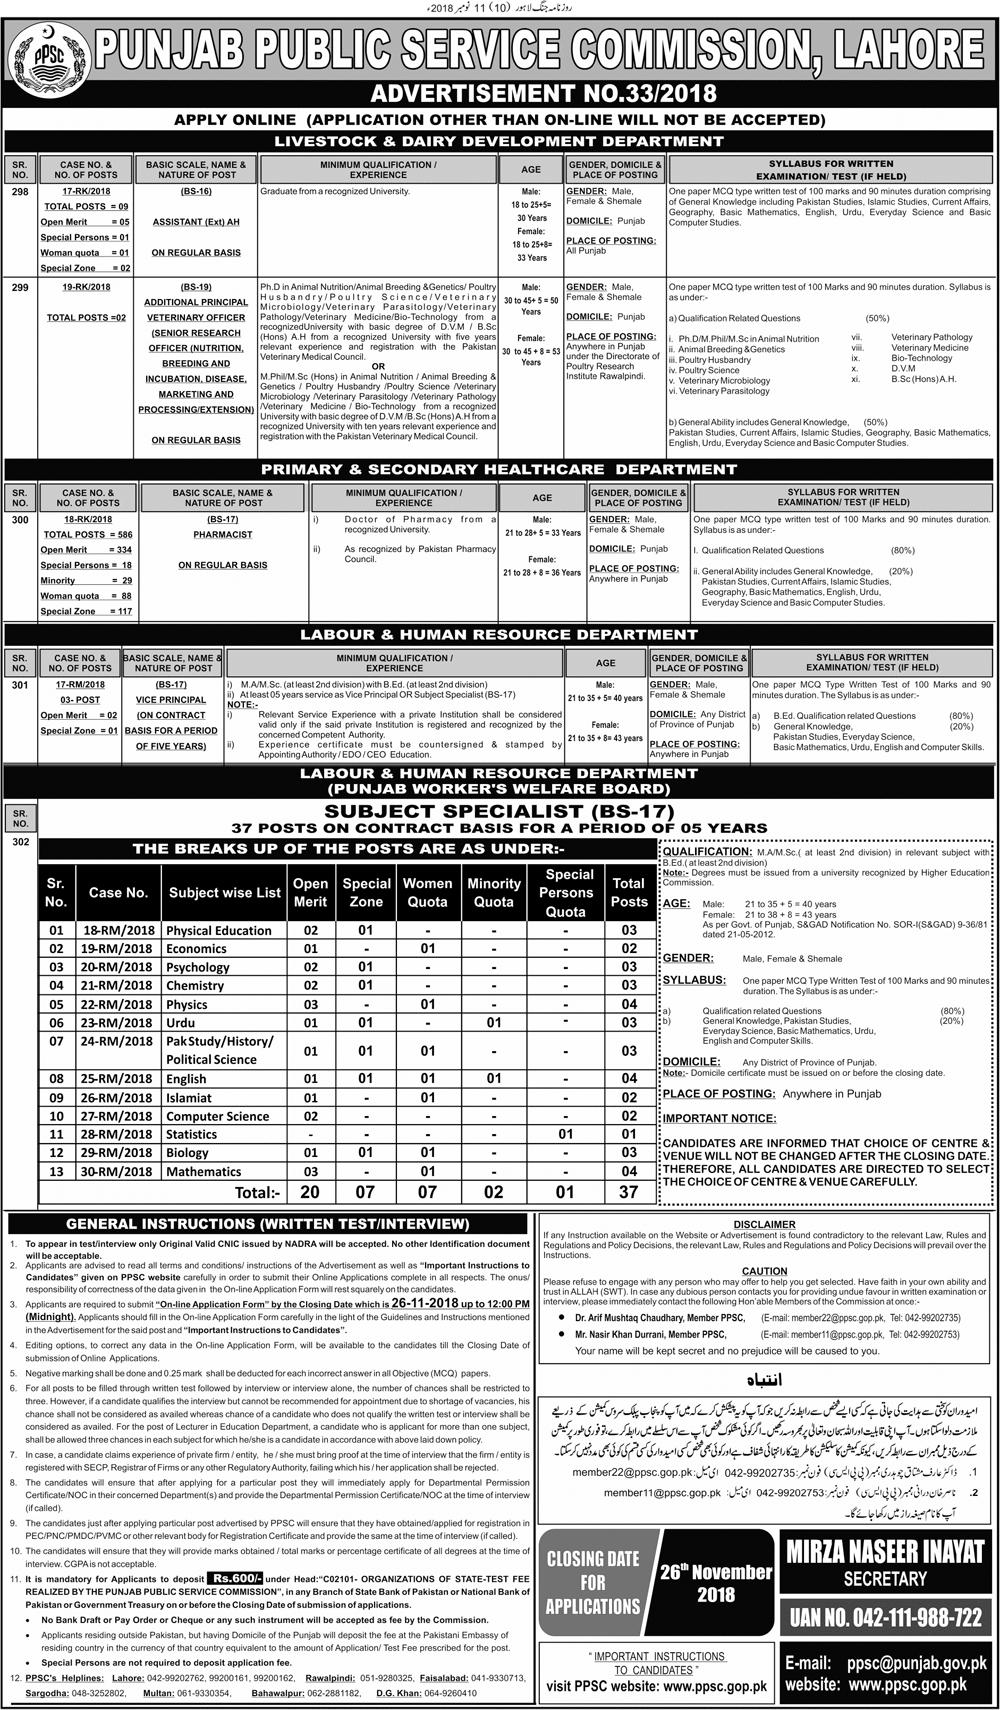 PPSC Punjab Public Service Commission Pharmacists Jobs 2018